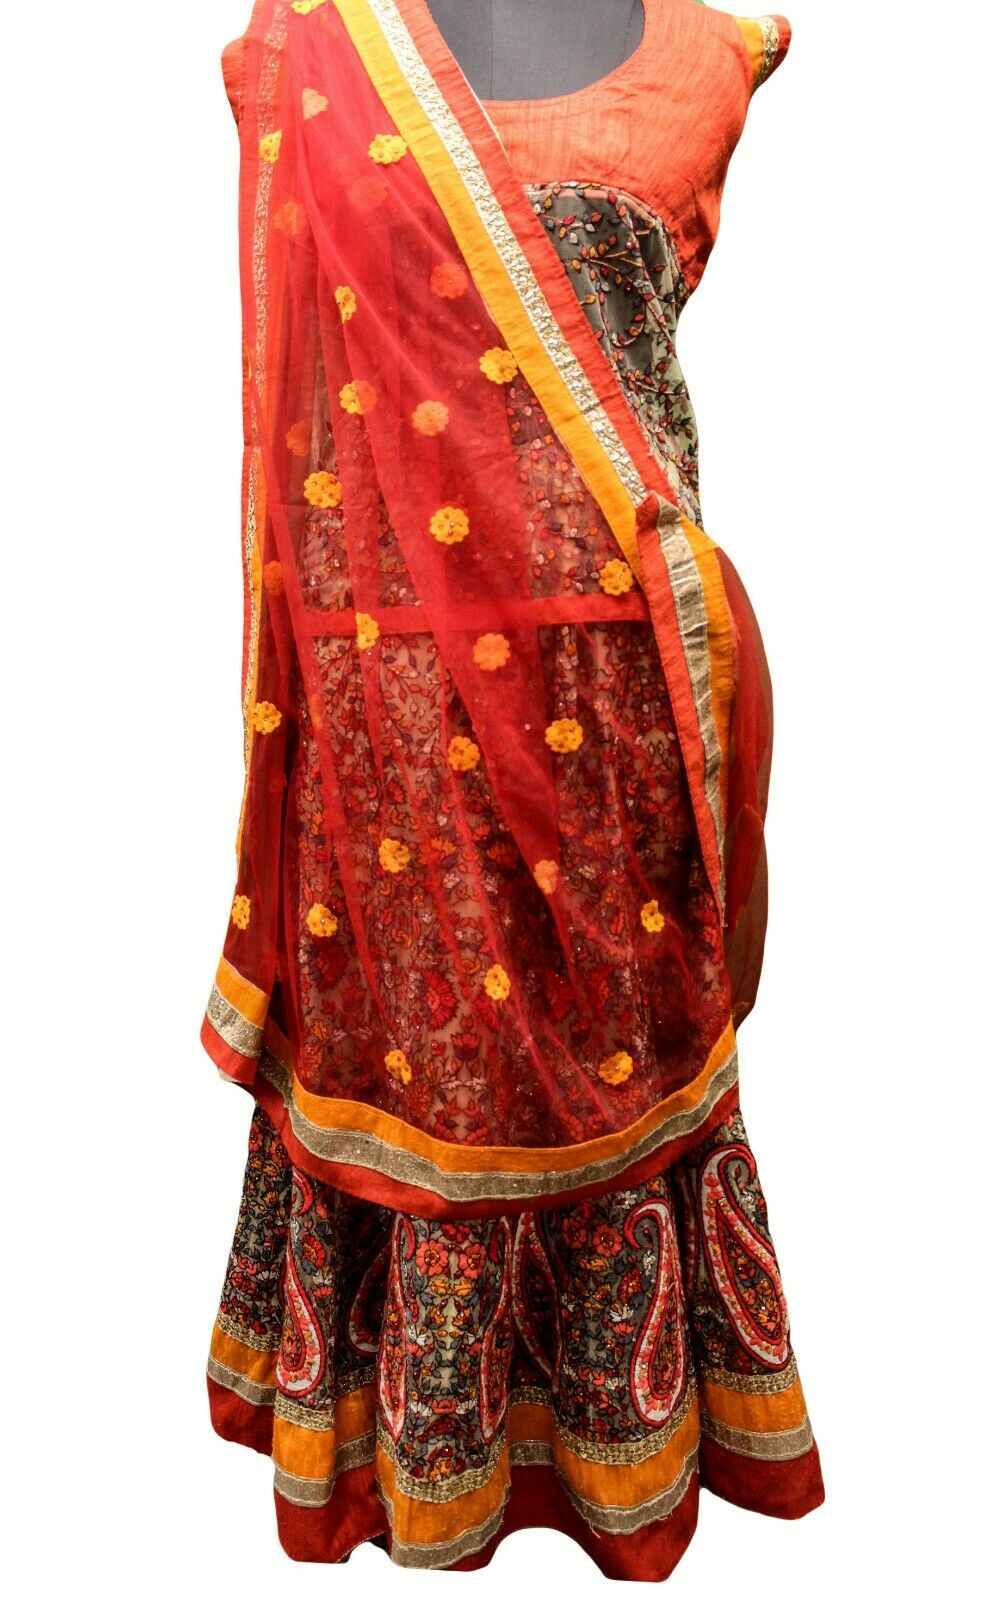 Vintage Indian Bestickter Rock Lang Lehenga Frau Hochzeitskleid Ethnisch HLS1141